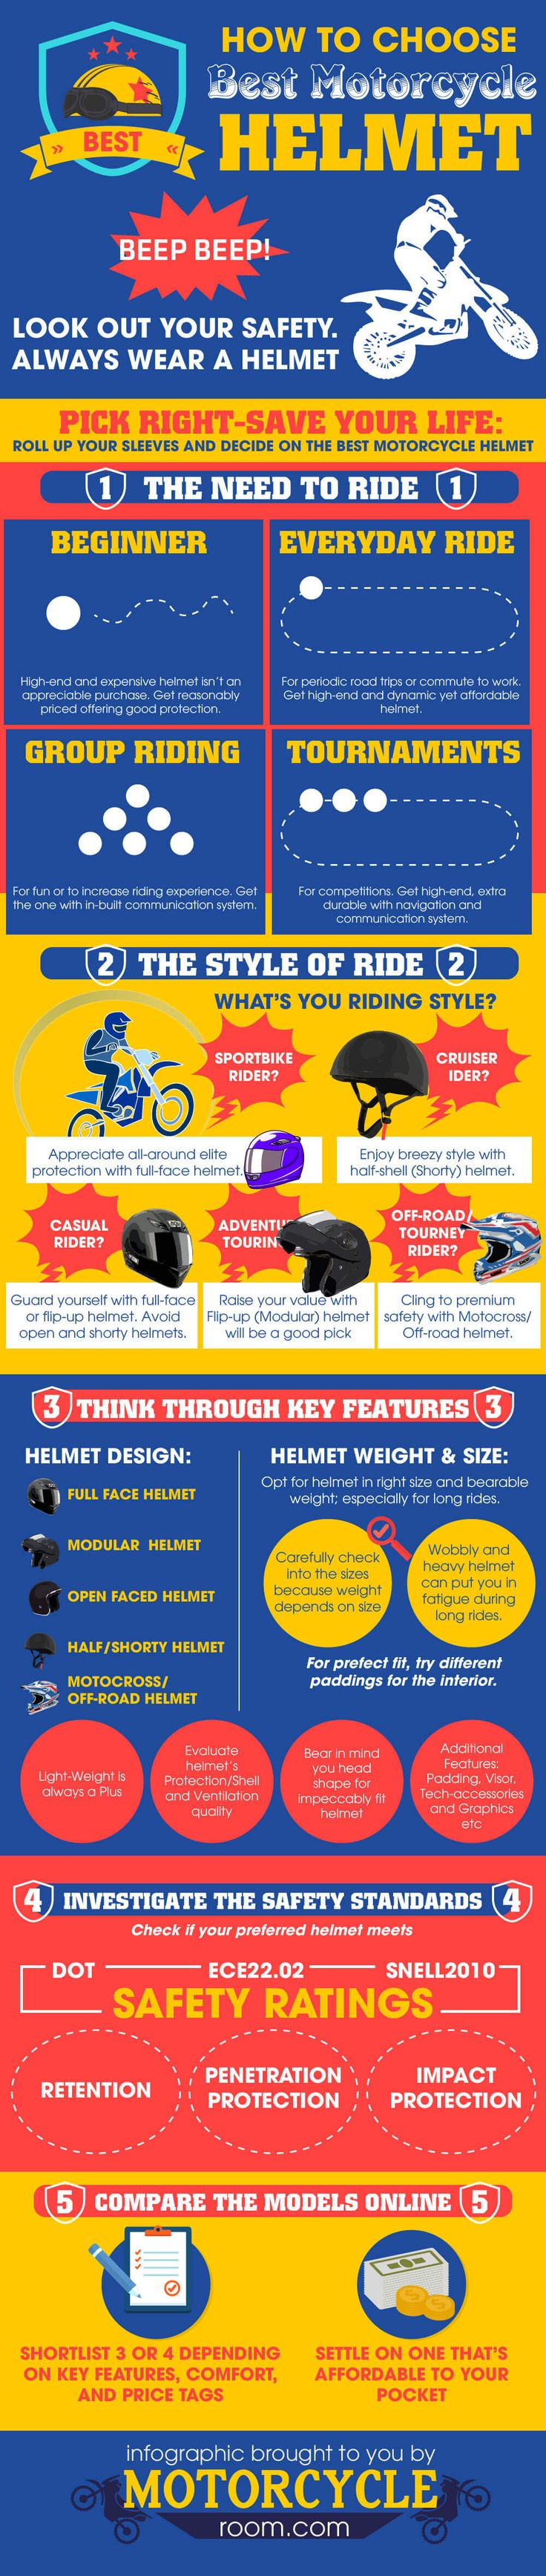 How To Choose Best Motorcycle Helmet #infographic #infografía